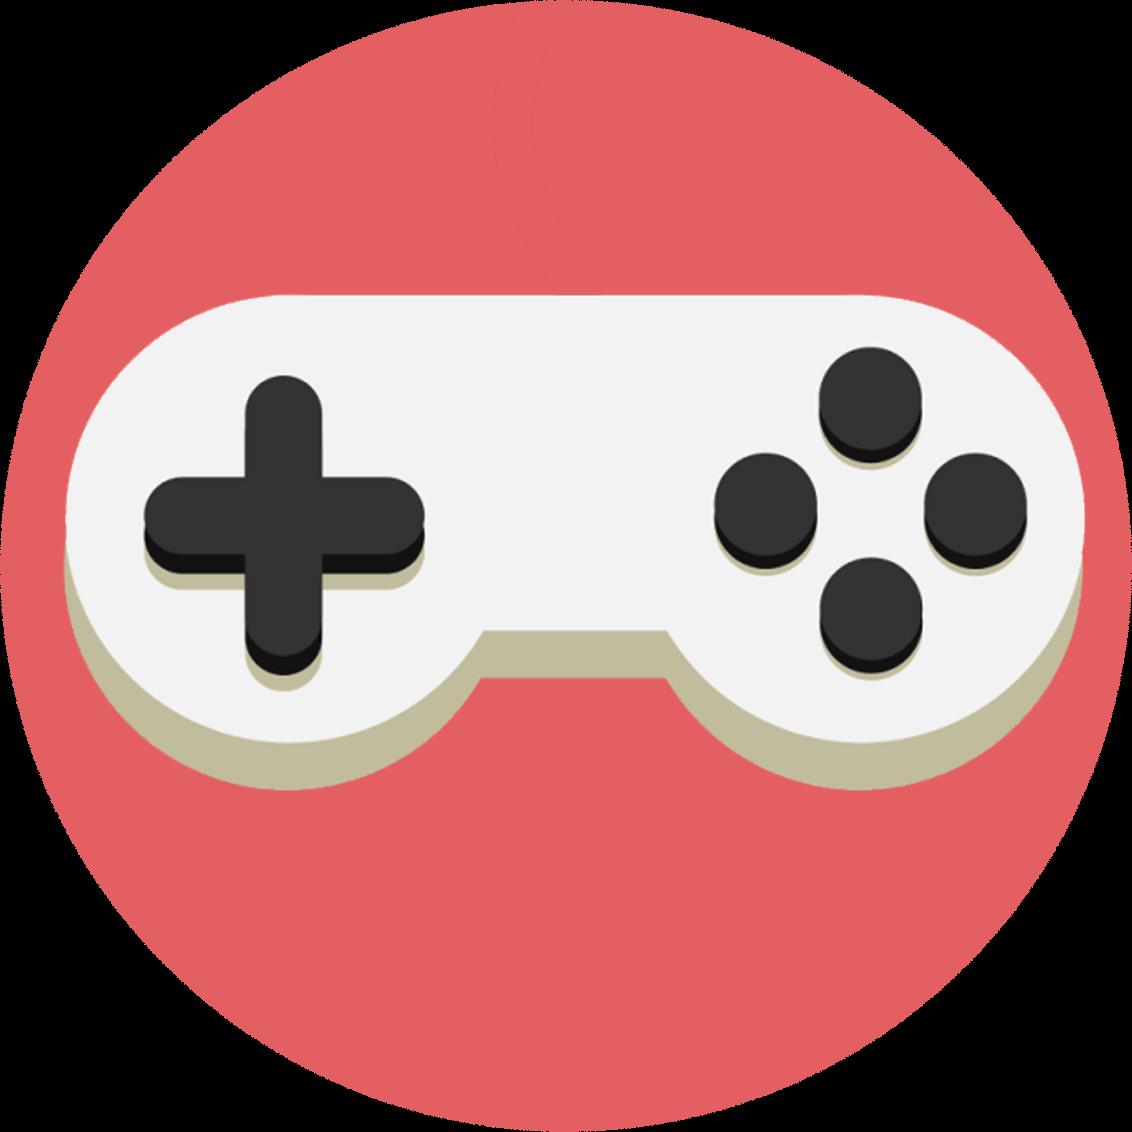 game development club logo